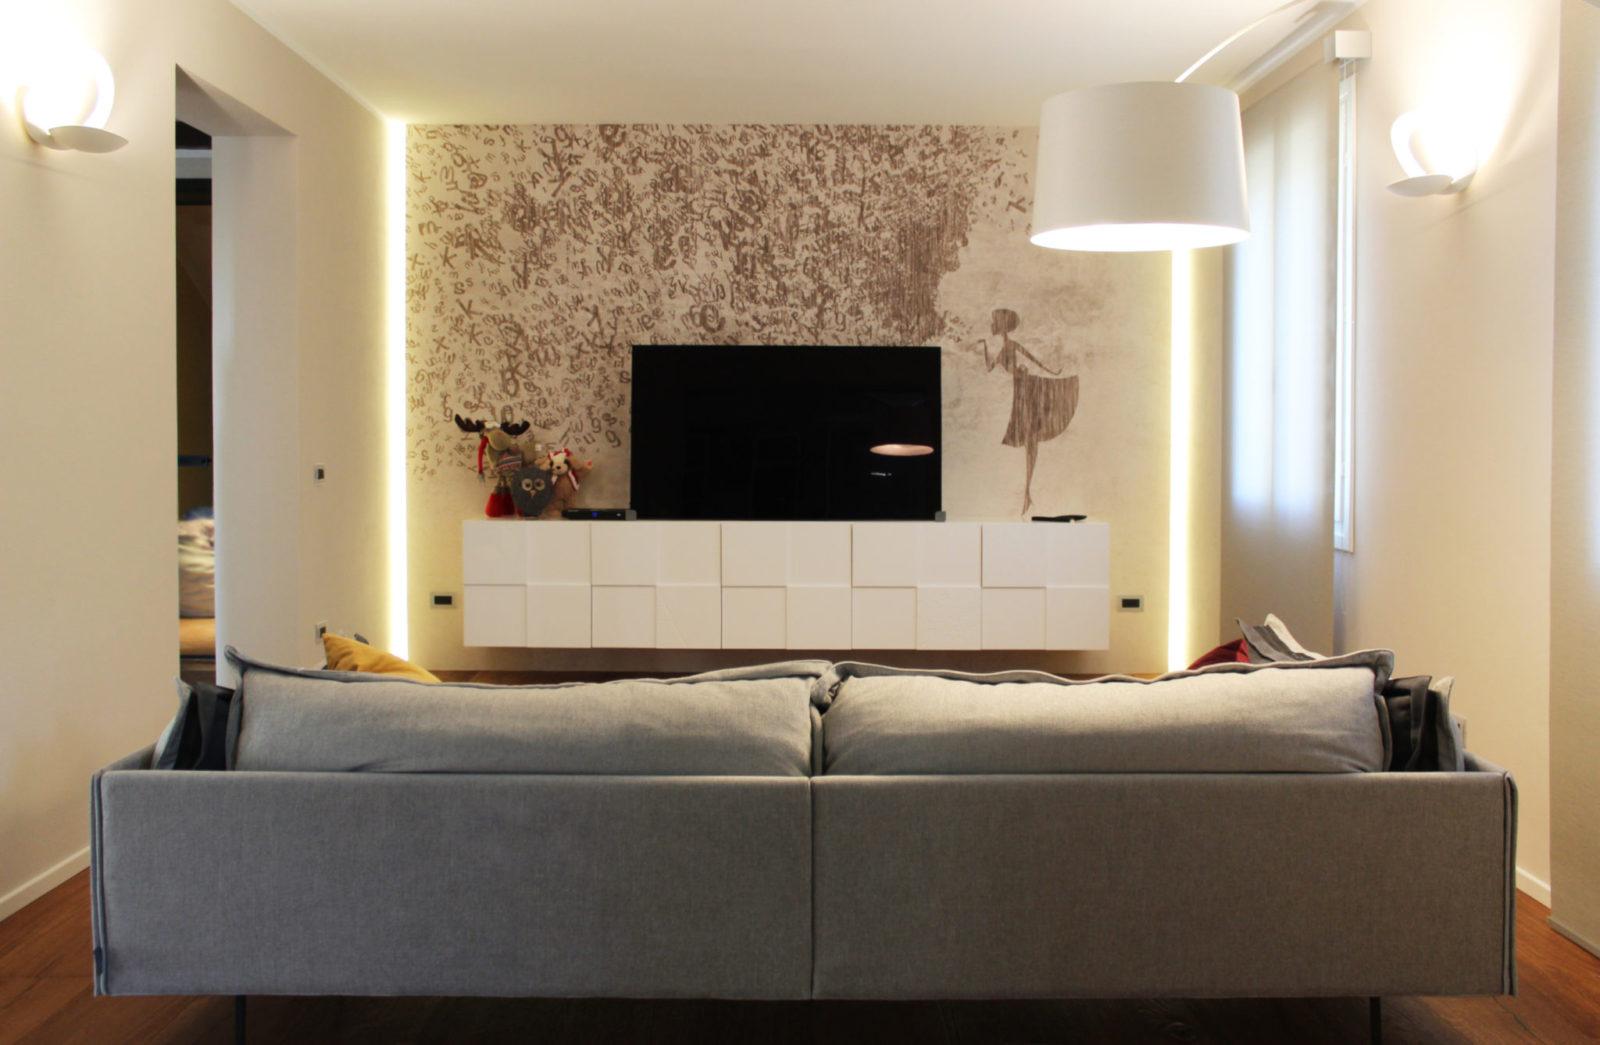 Arredamento Per Casali ristrutturazione casa di campagna: istruzioni pratiche e idee